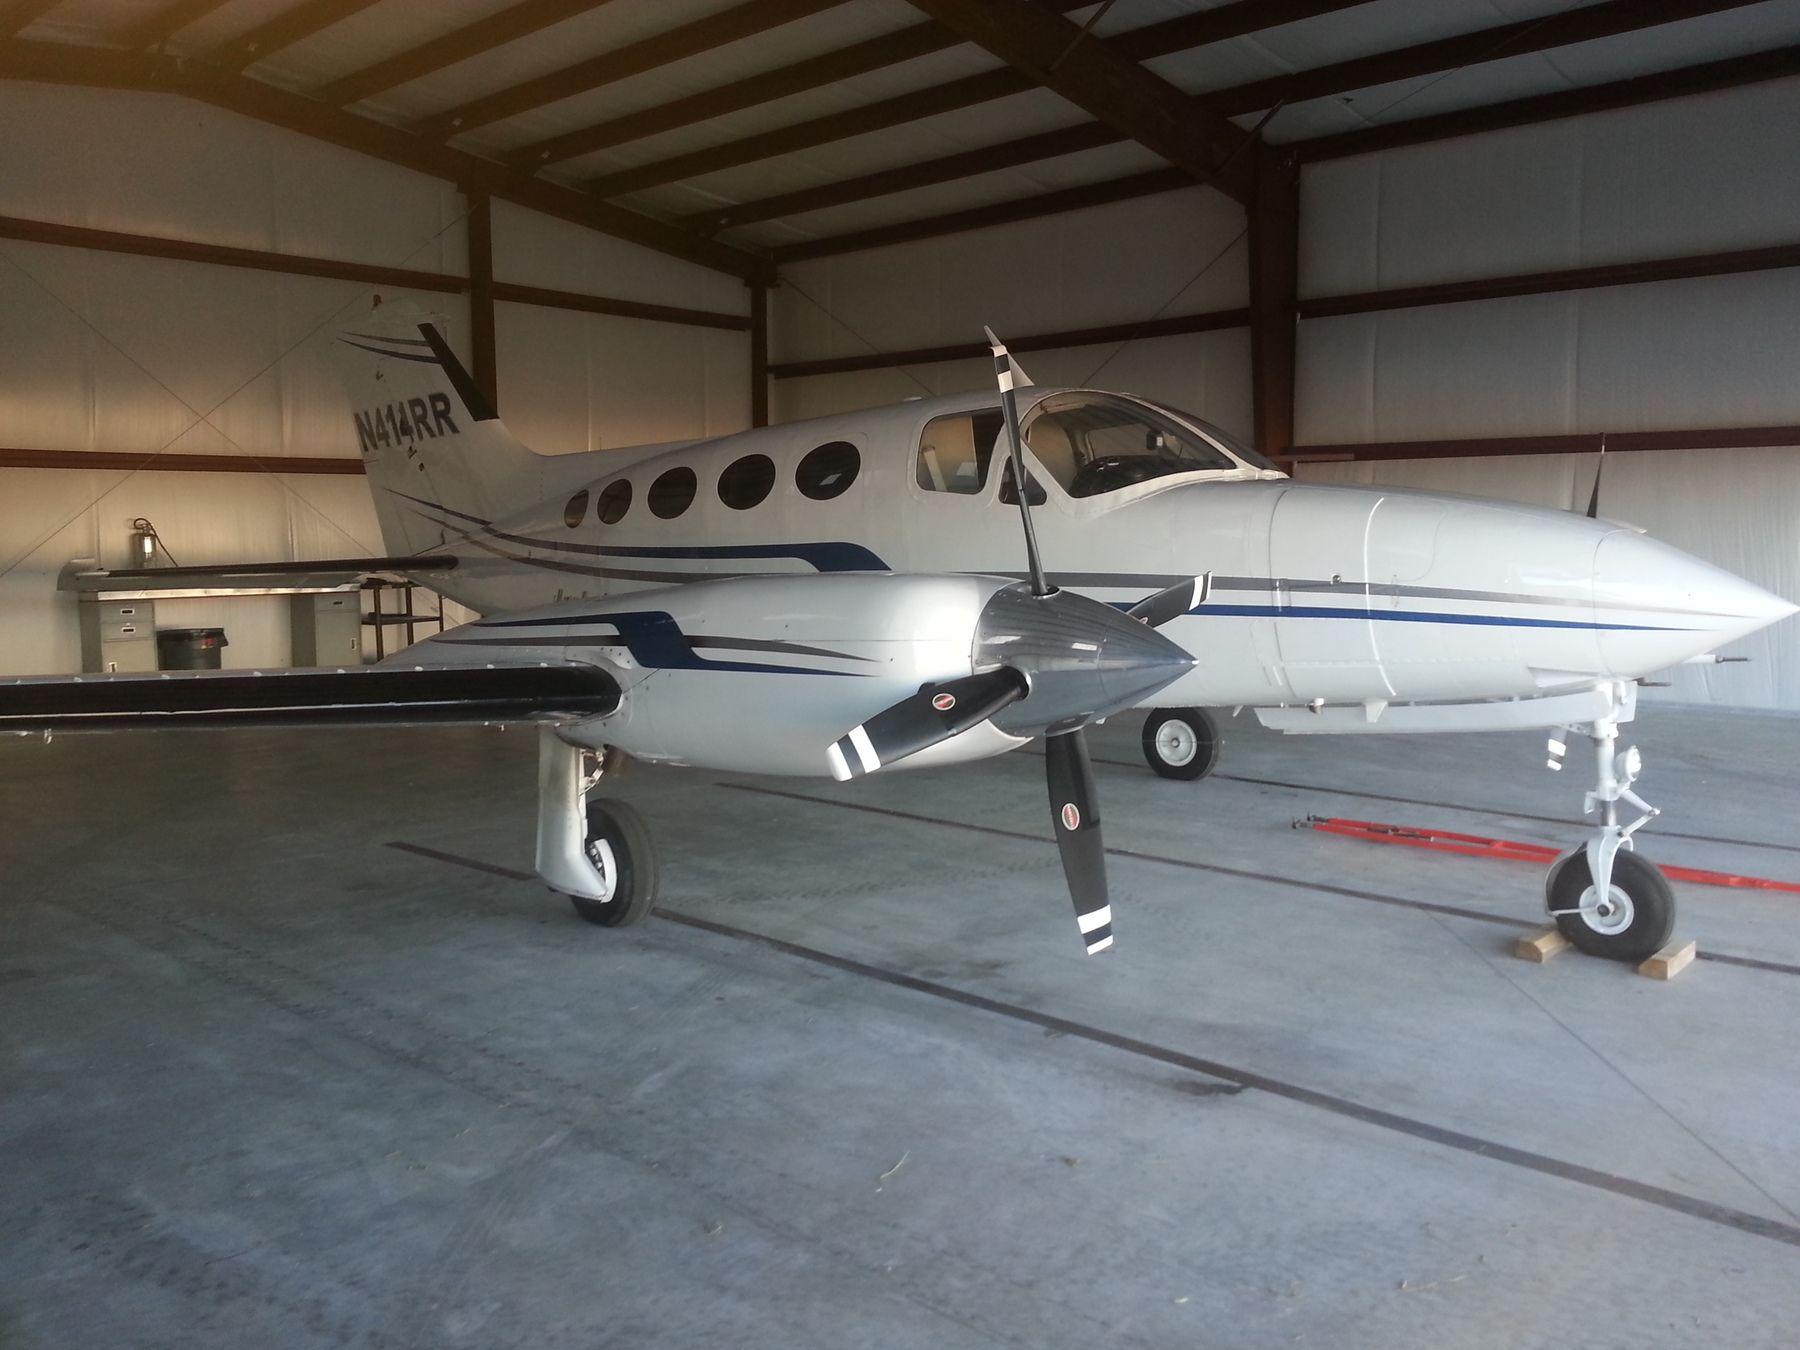 1973 Cessna 414 Riley Rocket for sale in (KANK) Salida, CO